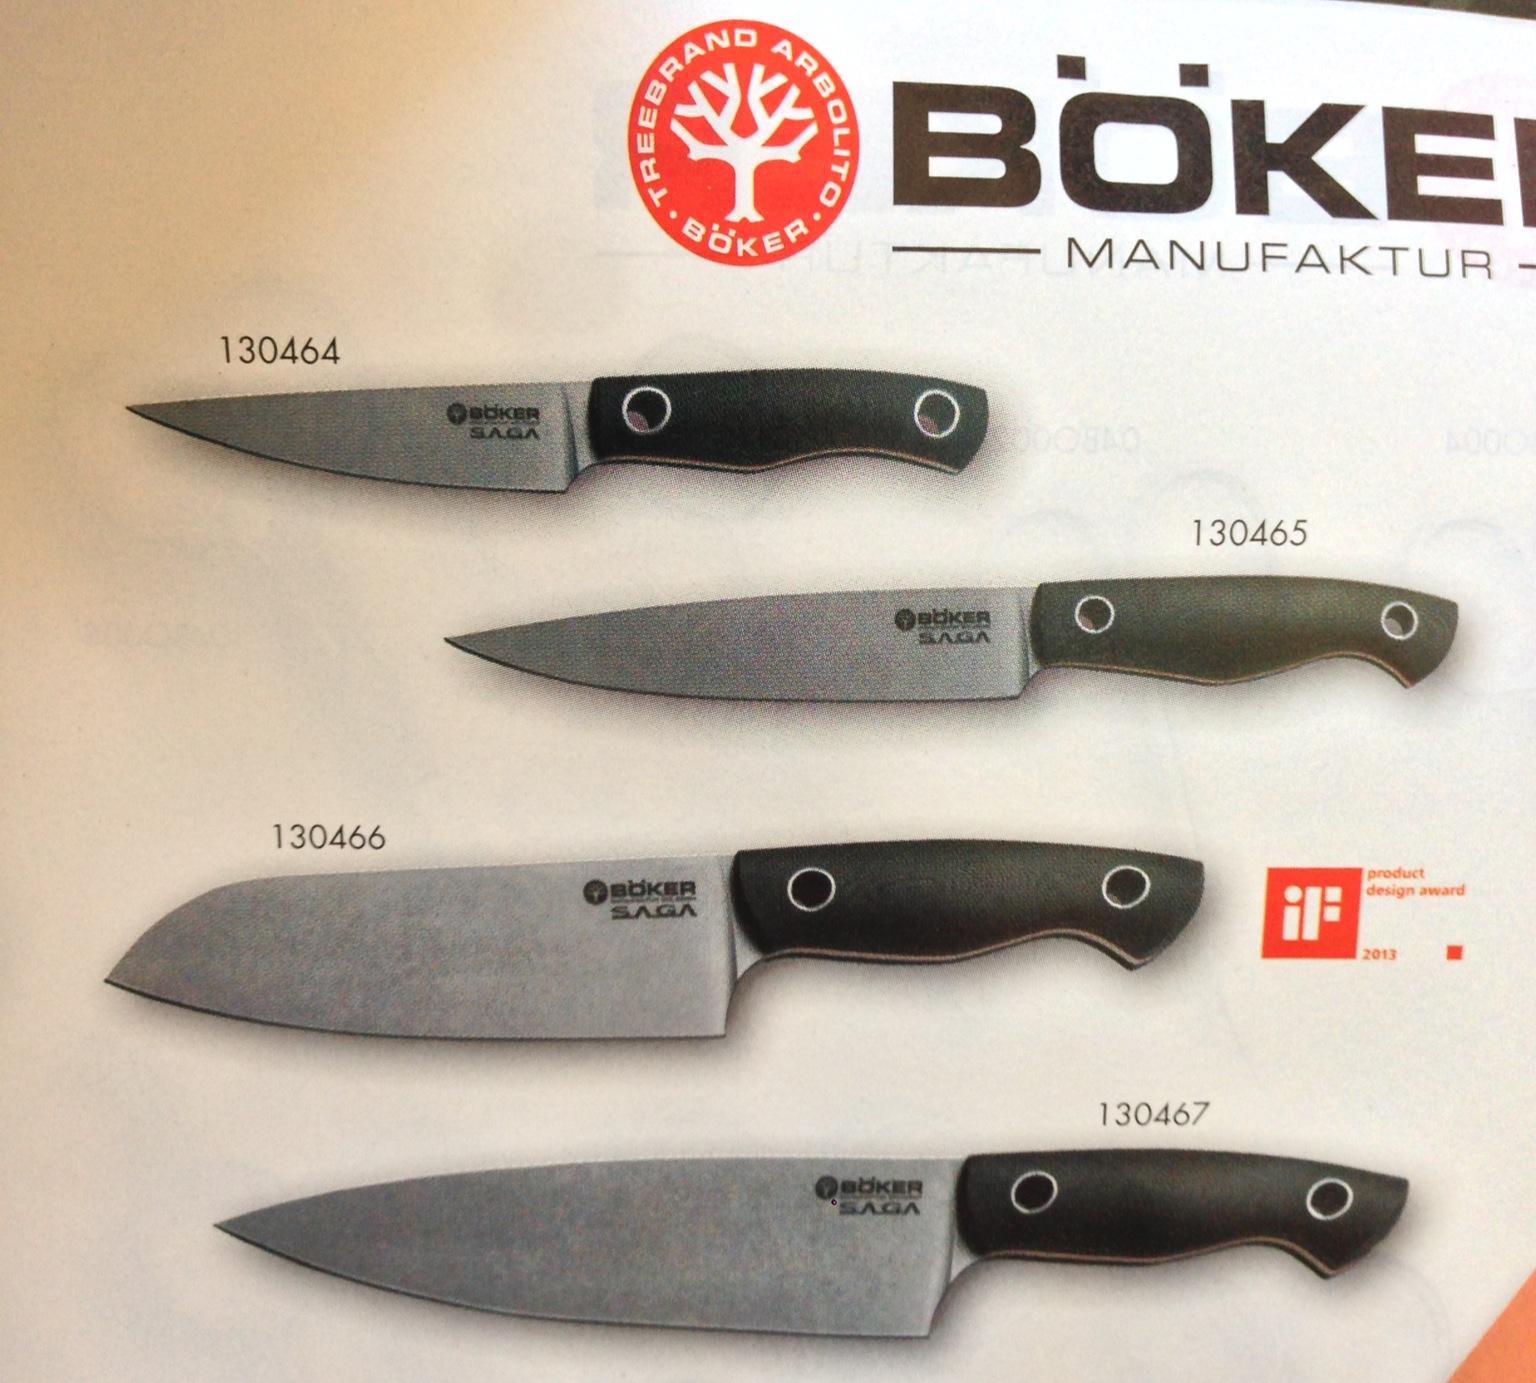 mobile knife sharpening knife sales august 2013